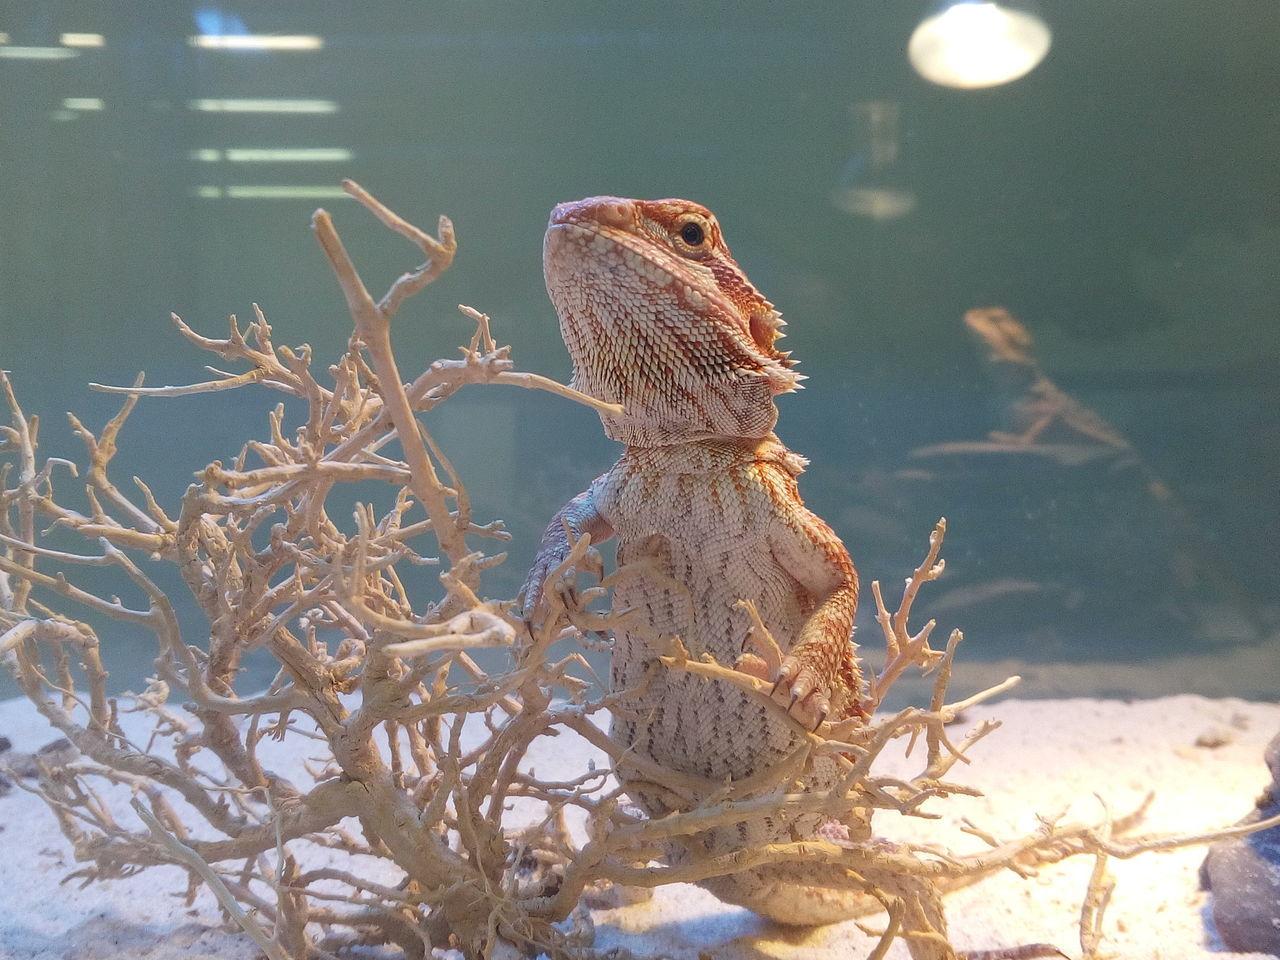 Pogona Agamalizard Agama Lizards Agama Animal Themes